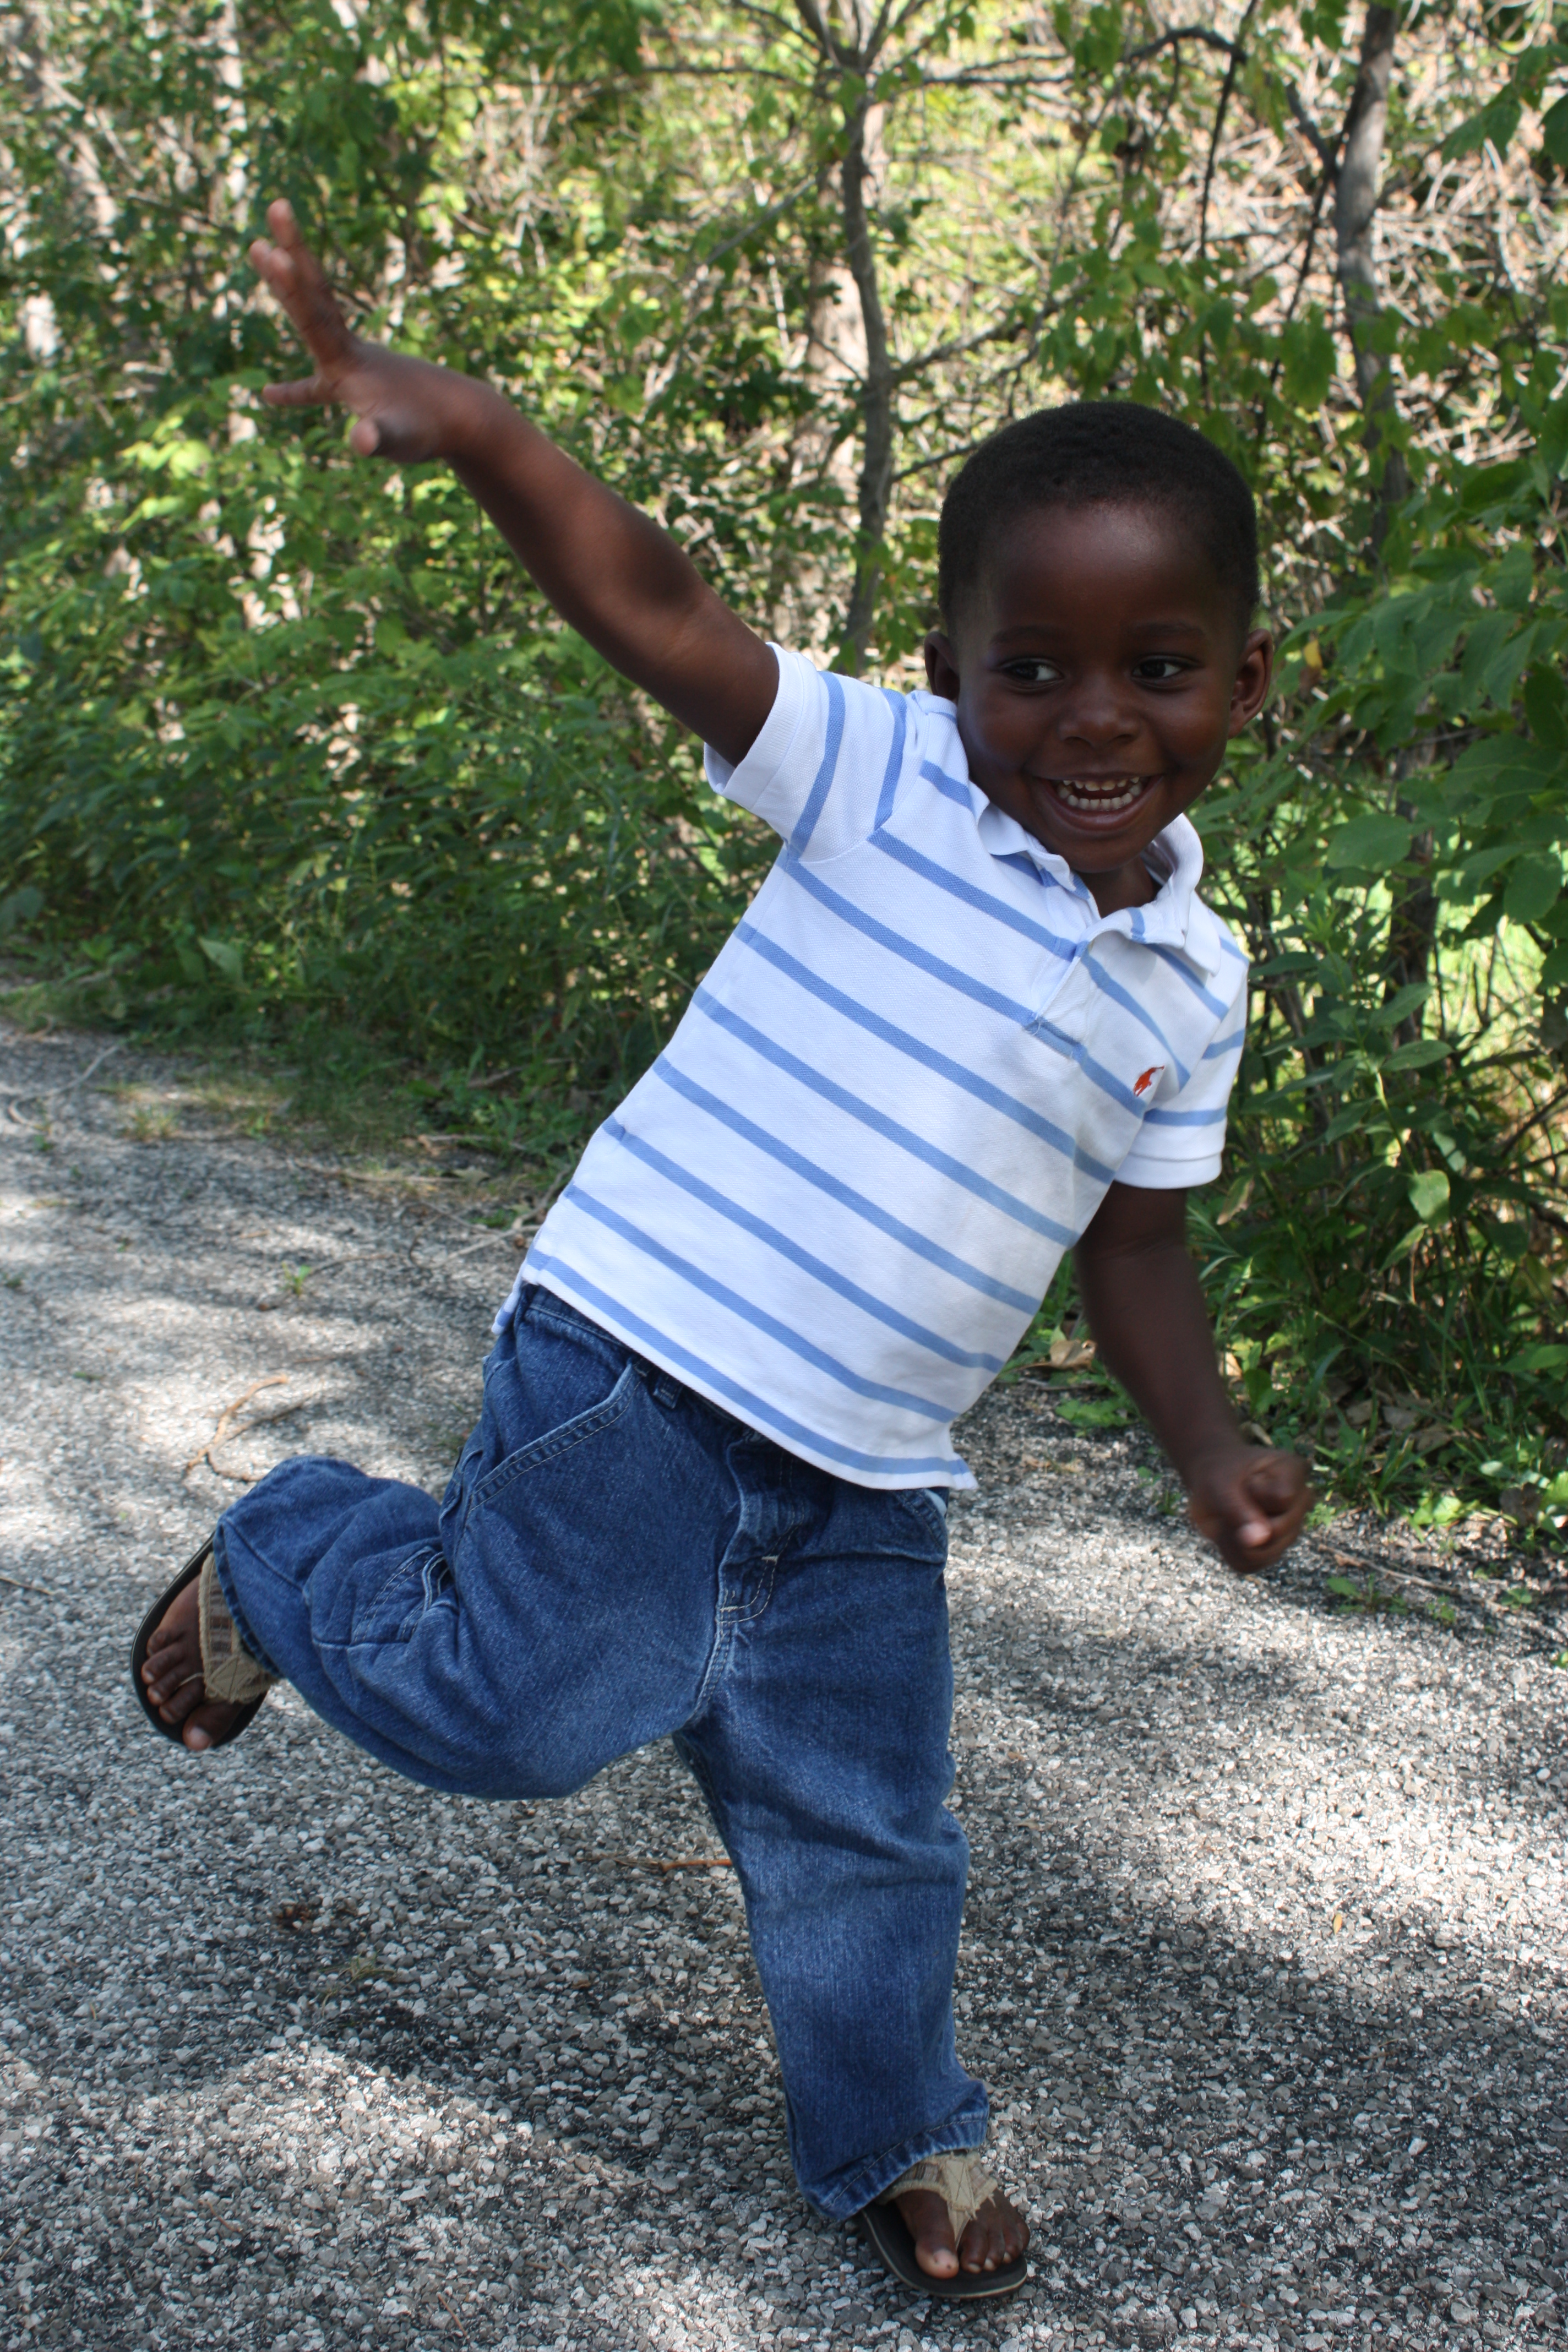 Boy - Dancing